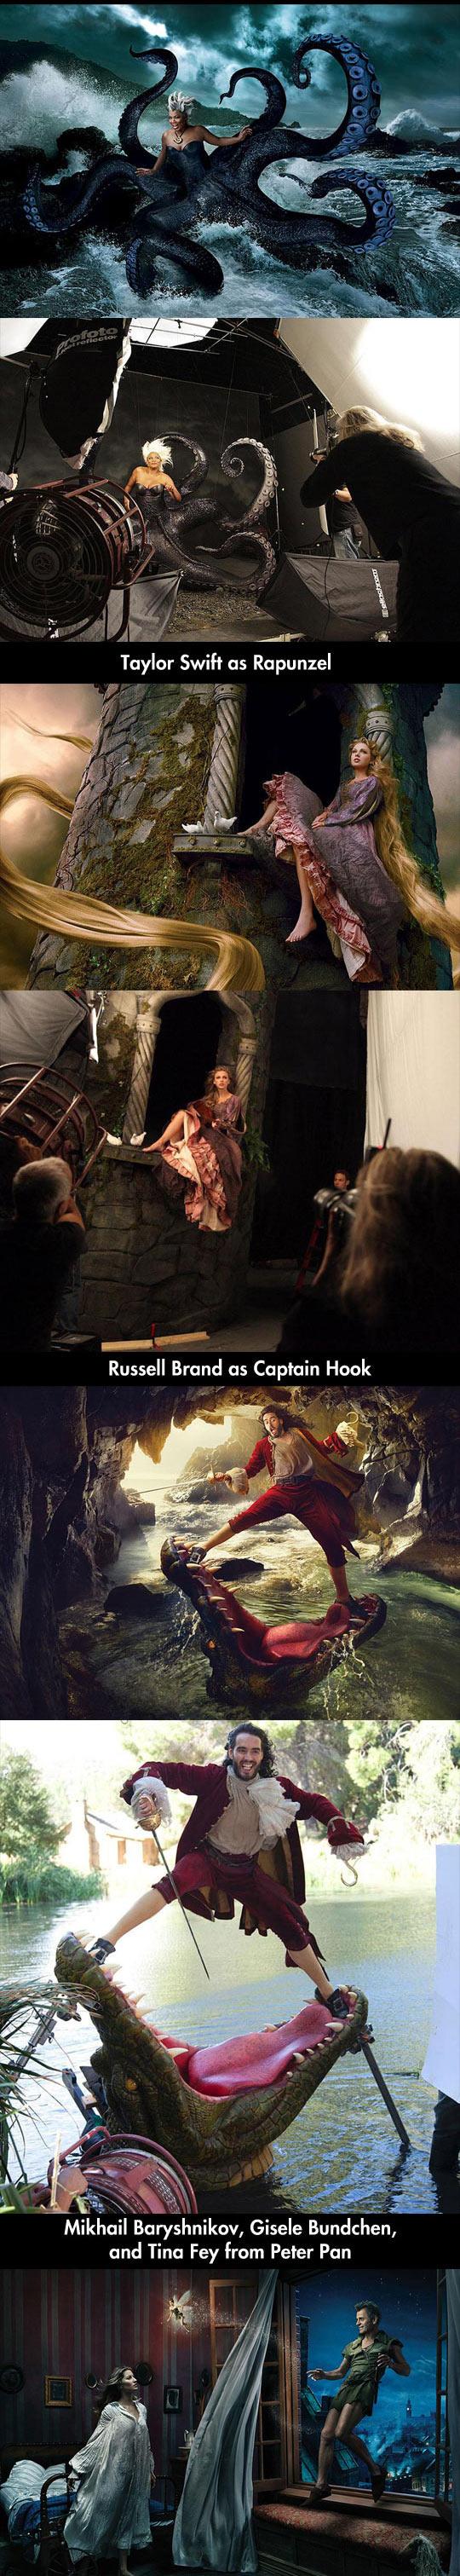 funny-Disney-dream-photo-manipulation-movies-Mermaid